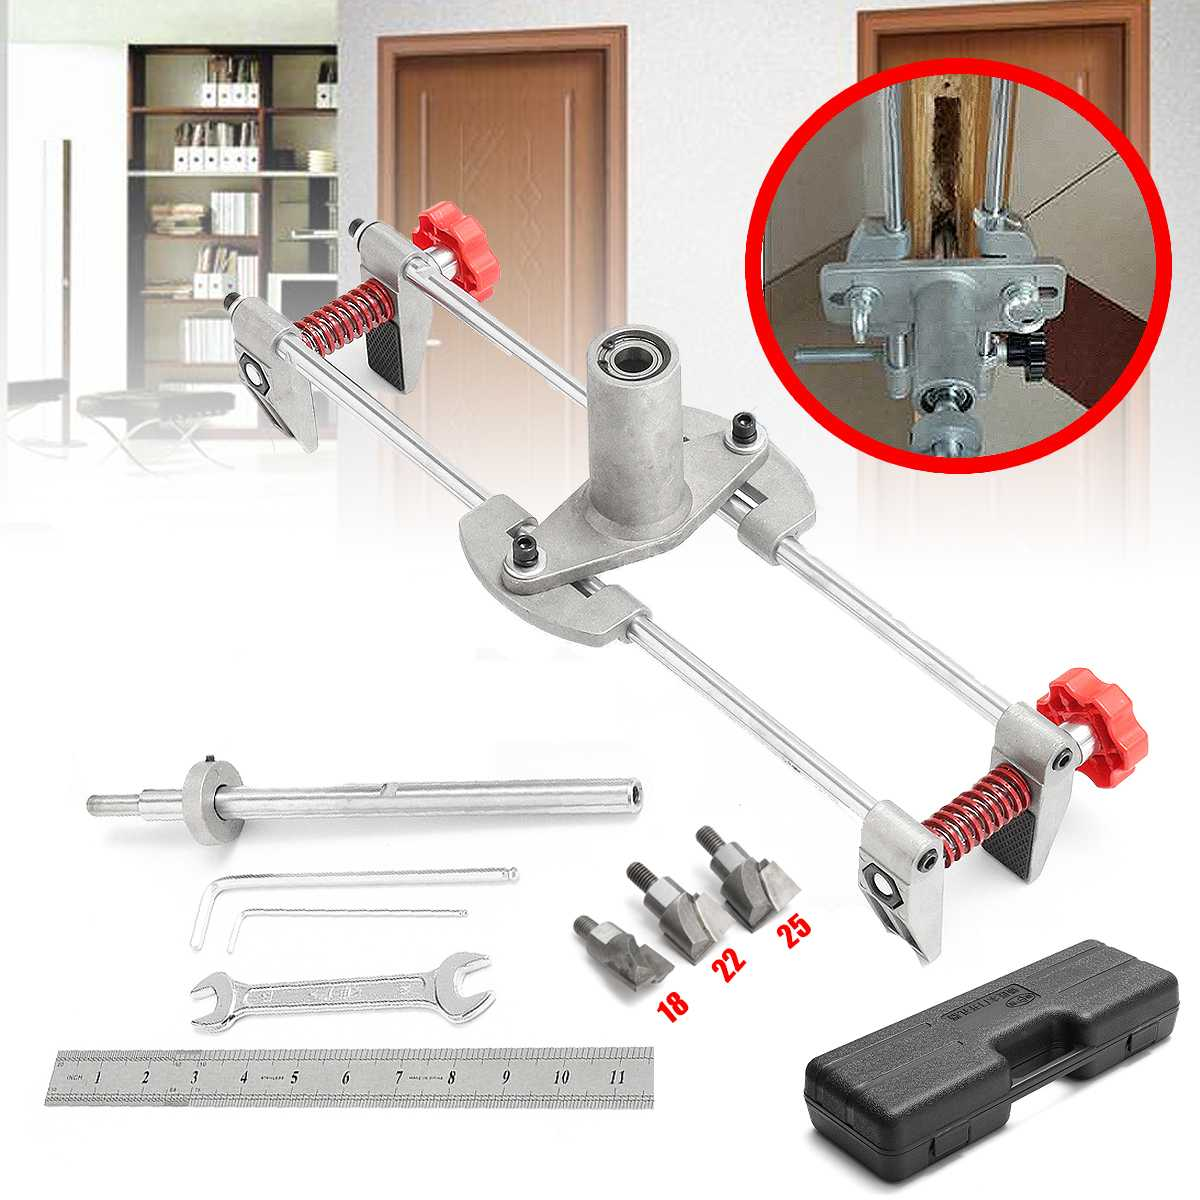 DBB Lock Jig Pcs Door Case With 8 JIG1 Mortiser Security Cutters 3 Kit Mortice Lock Maintenance Tool Door Mortice Key Fitting